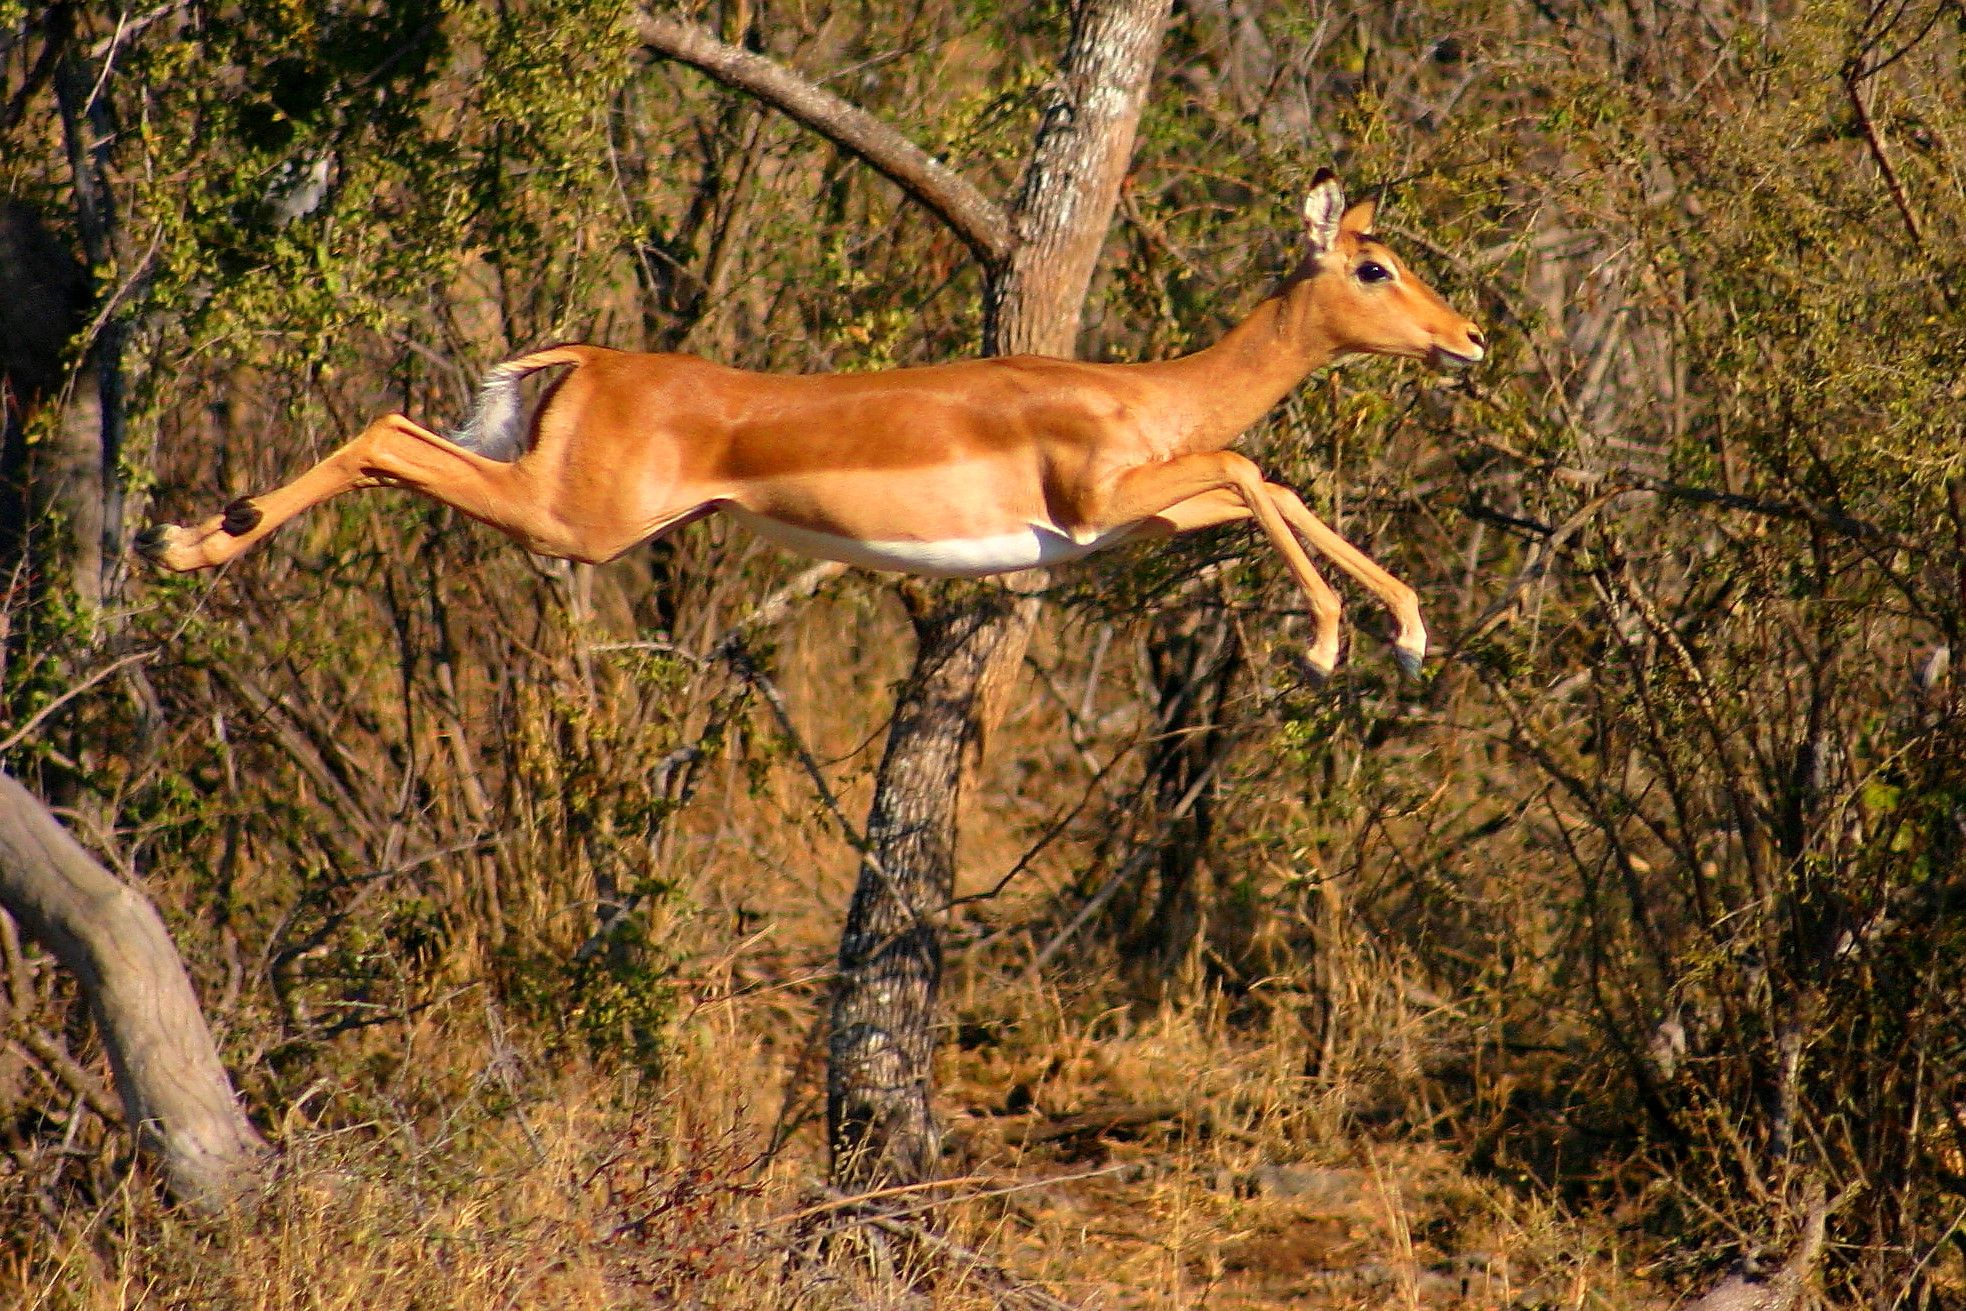 springbok gazelle - Google Search | julie | Pinterest | Animal